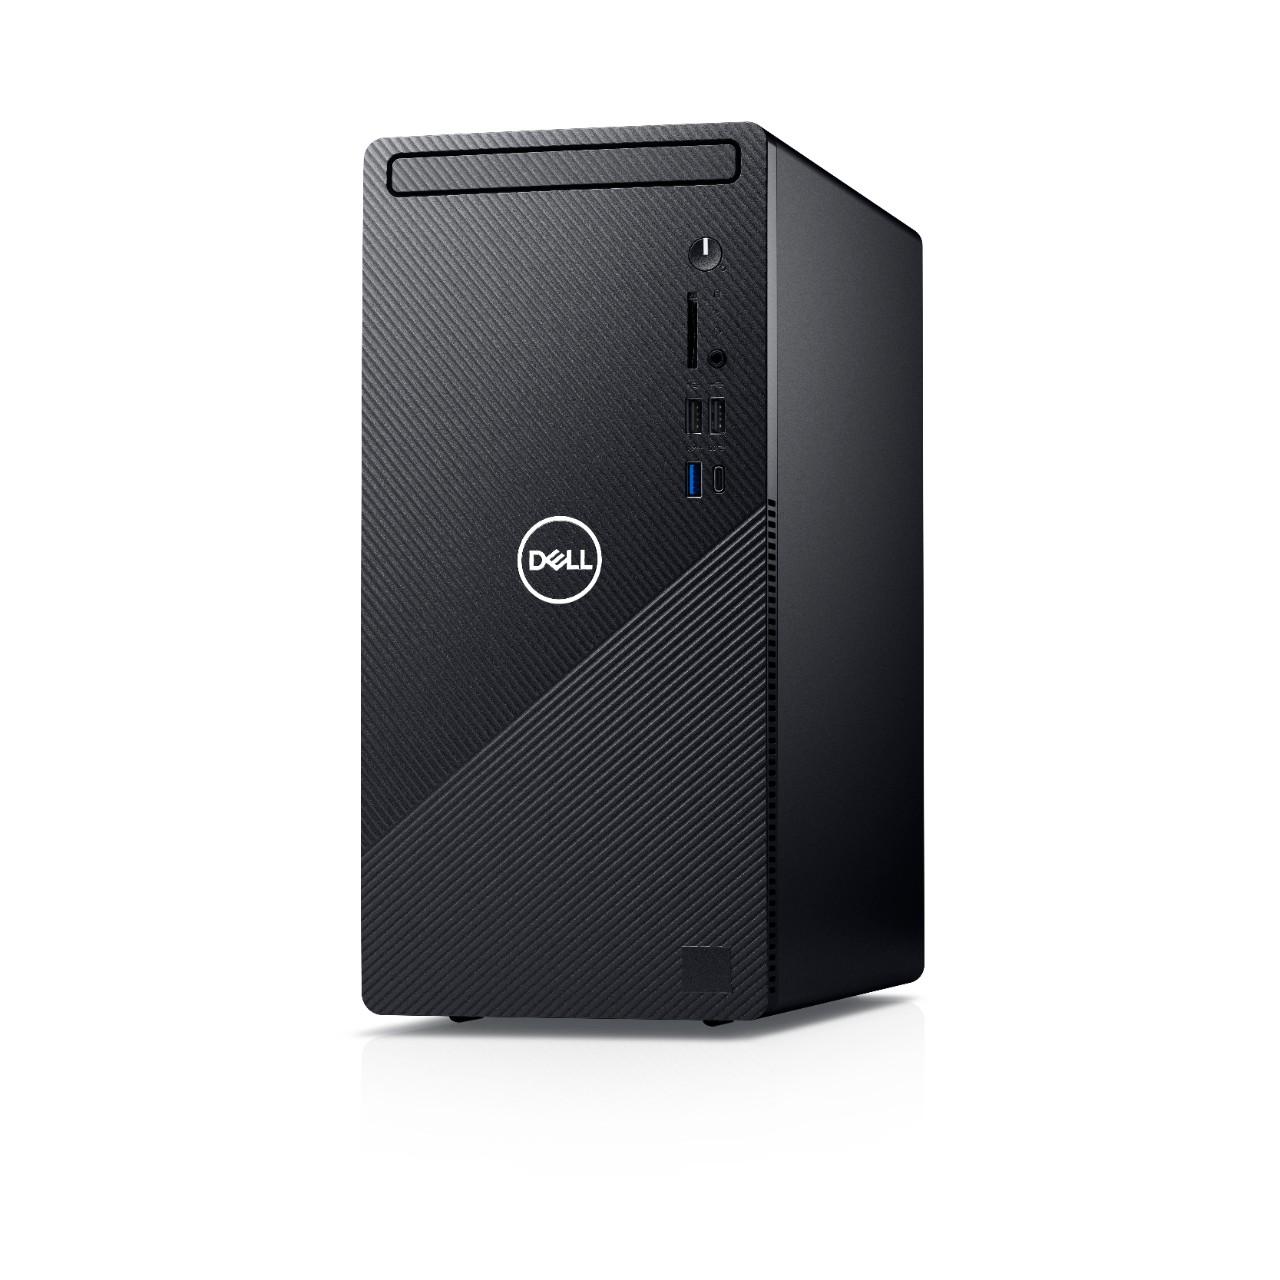 Dell Inspiron DT 3891 i7-10700F/8GB/512GB/DVD/1650-4GB/W10Pro/3RNBD/Černý - 3891-38033